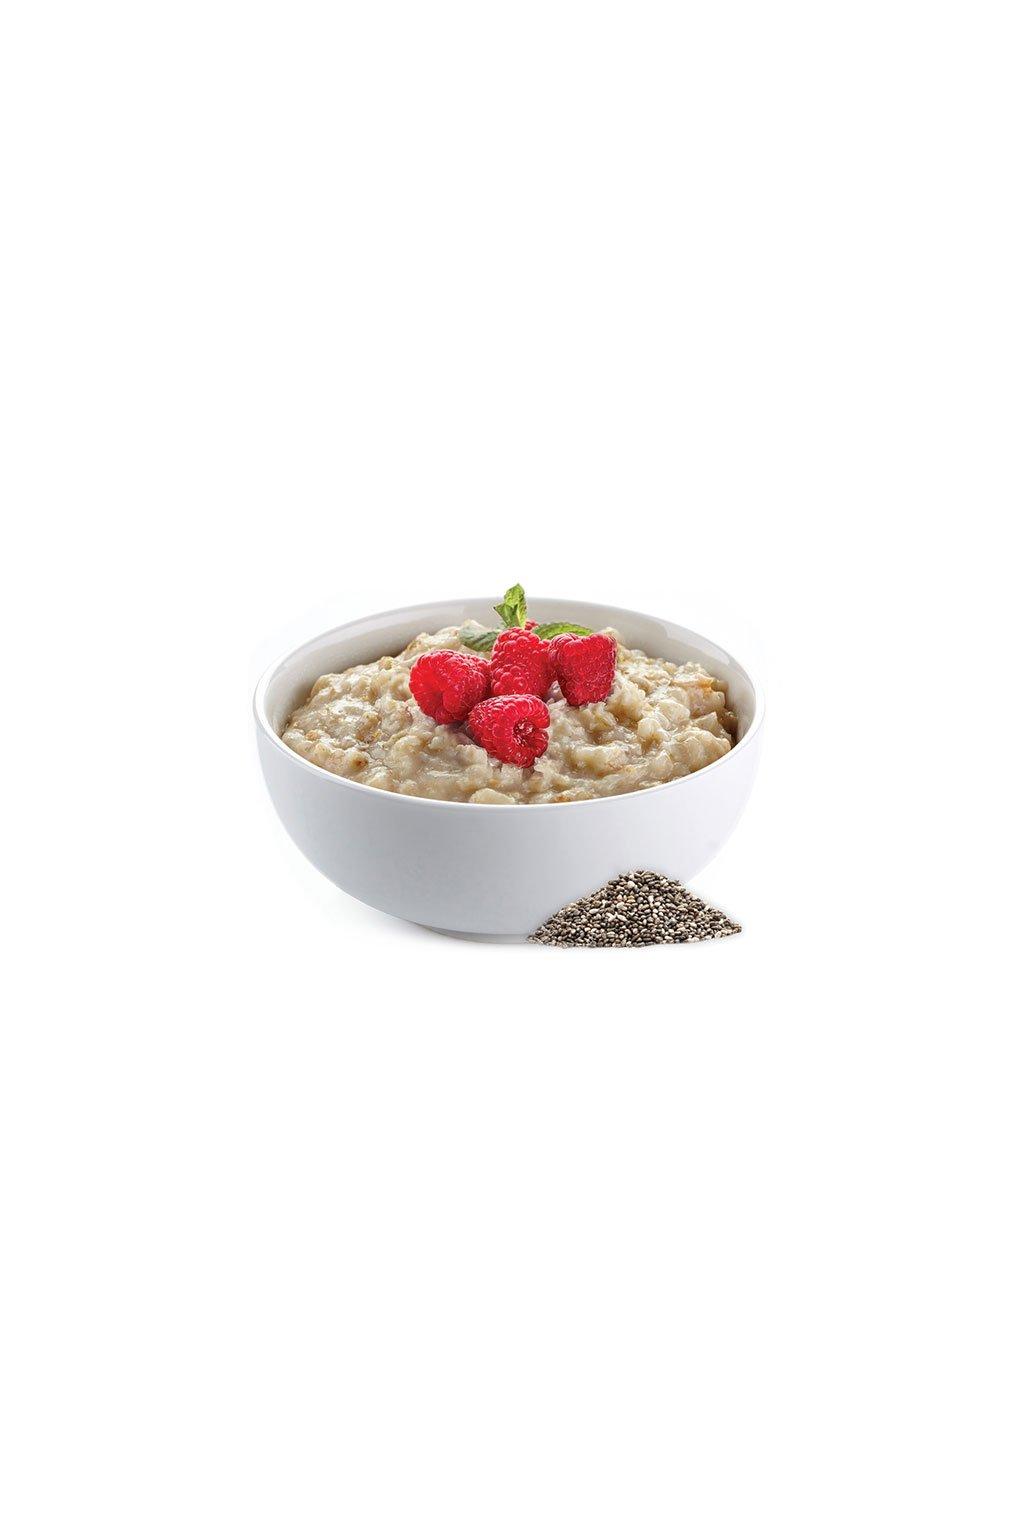 It's my life! Proteinová kaše malinová s chia semínky 40g (1 porce)